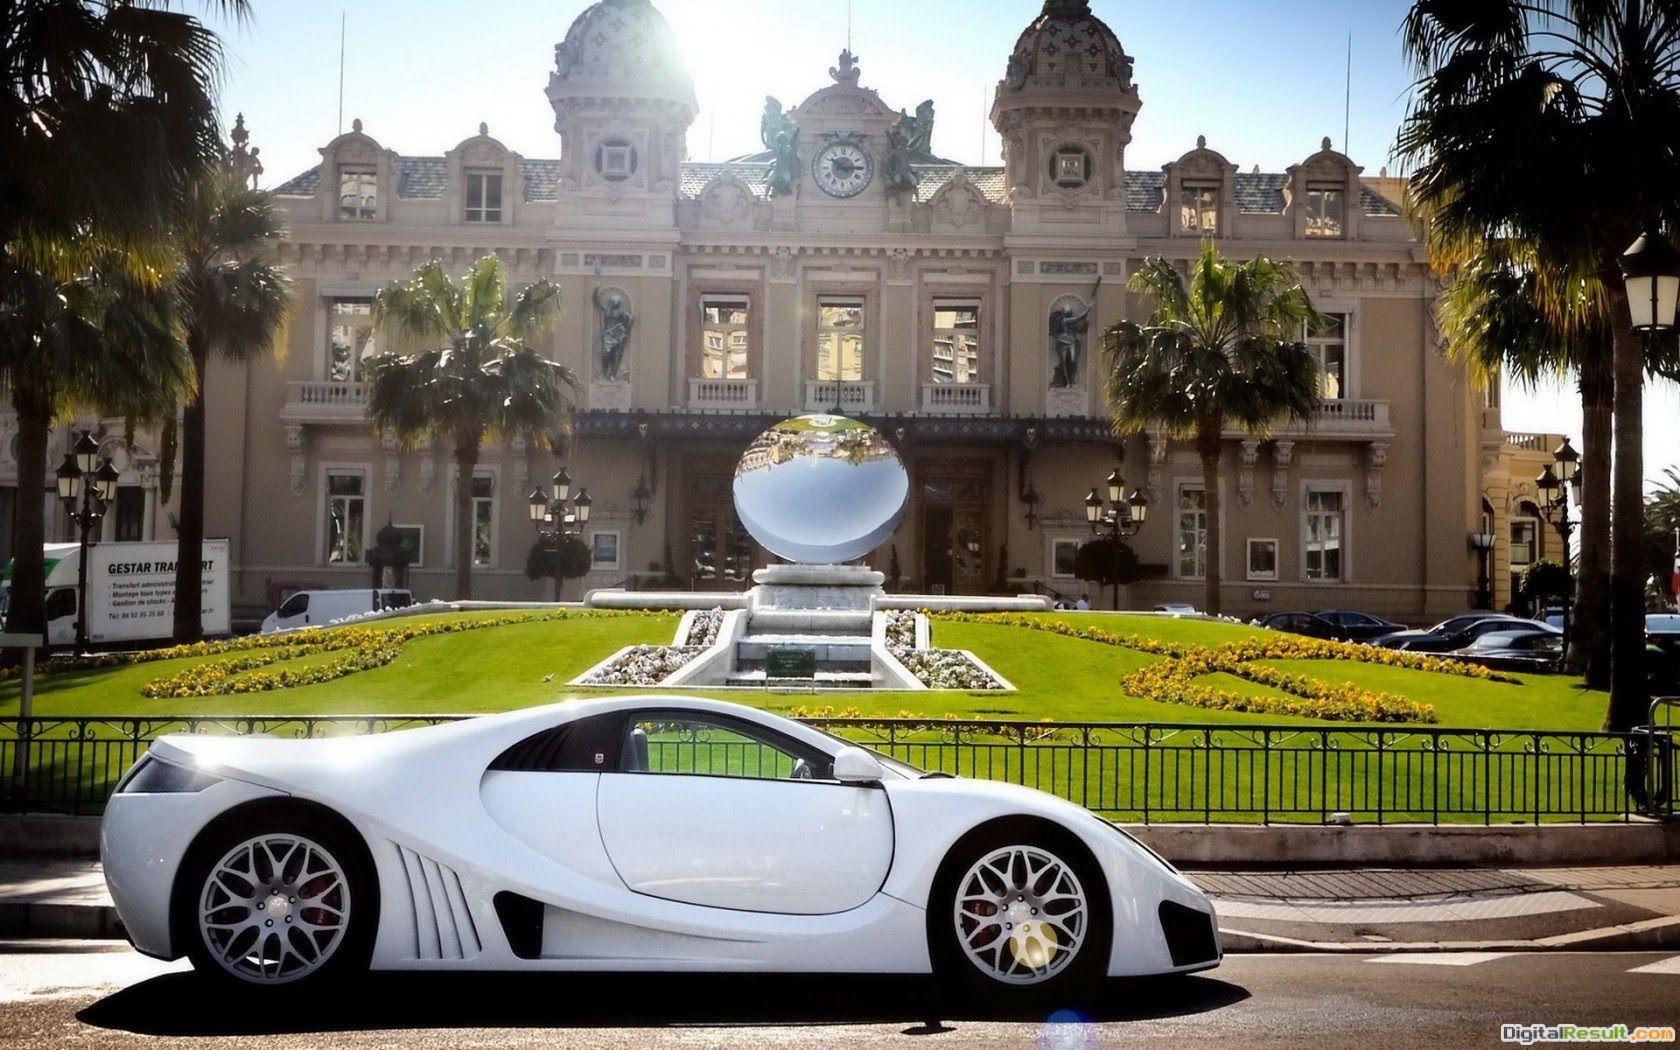 20 BILLIONAIRE MansionsThe Luxurious MANSIONS of Billionaires 918 1680x1050